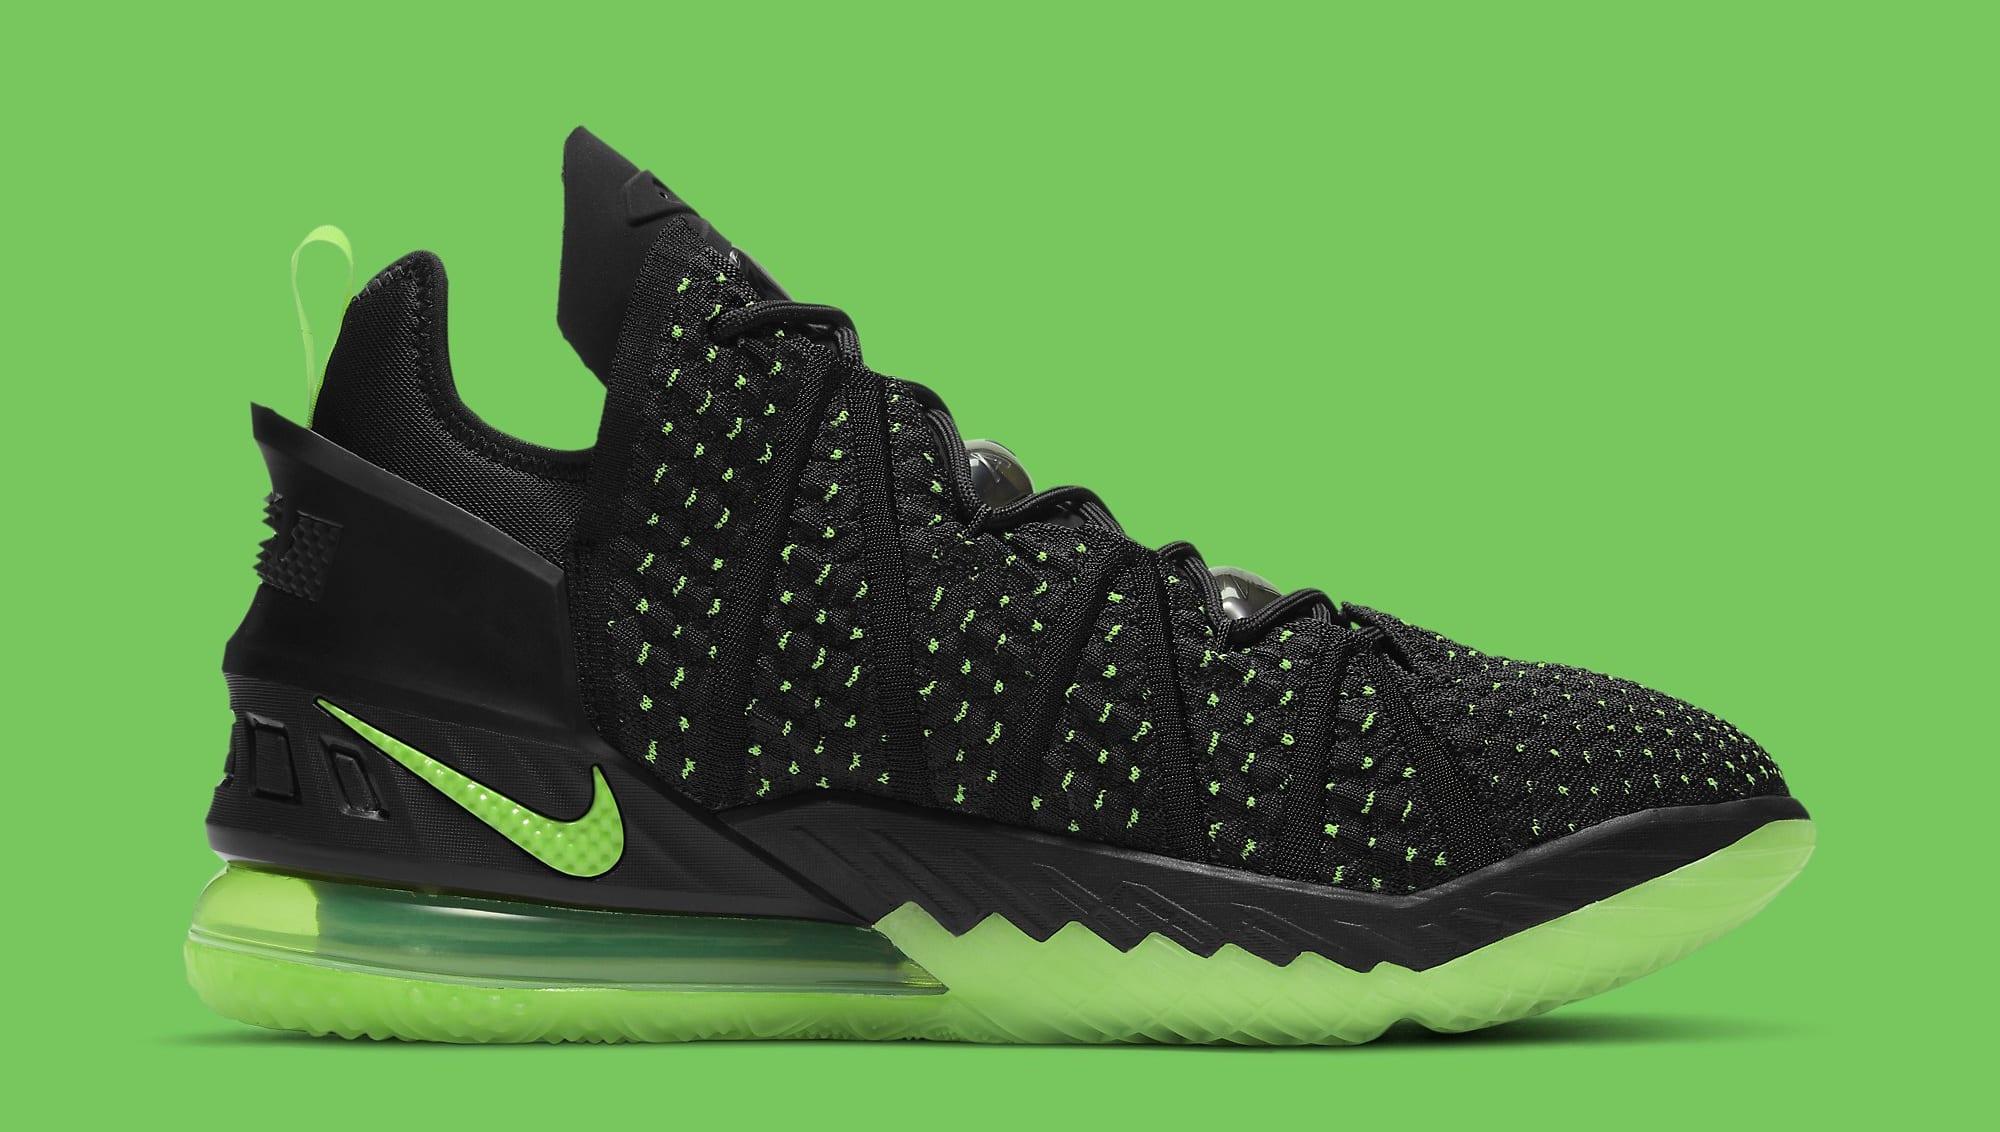 Nike LeBron 18 'Dunkman' CQ9284-005 Medial